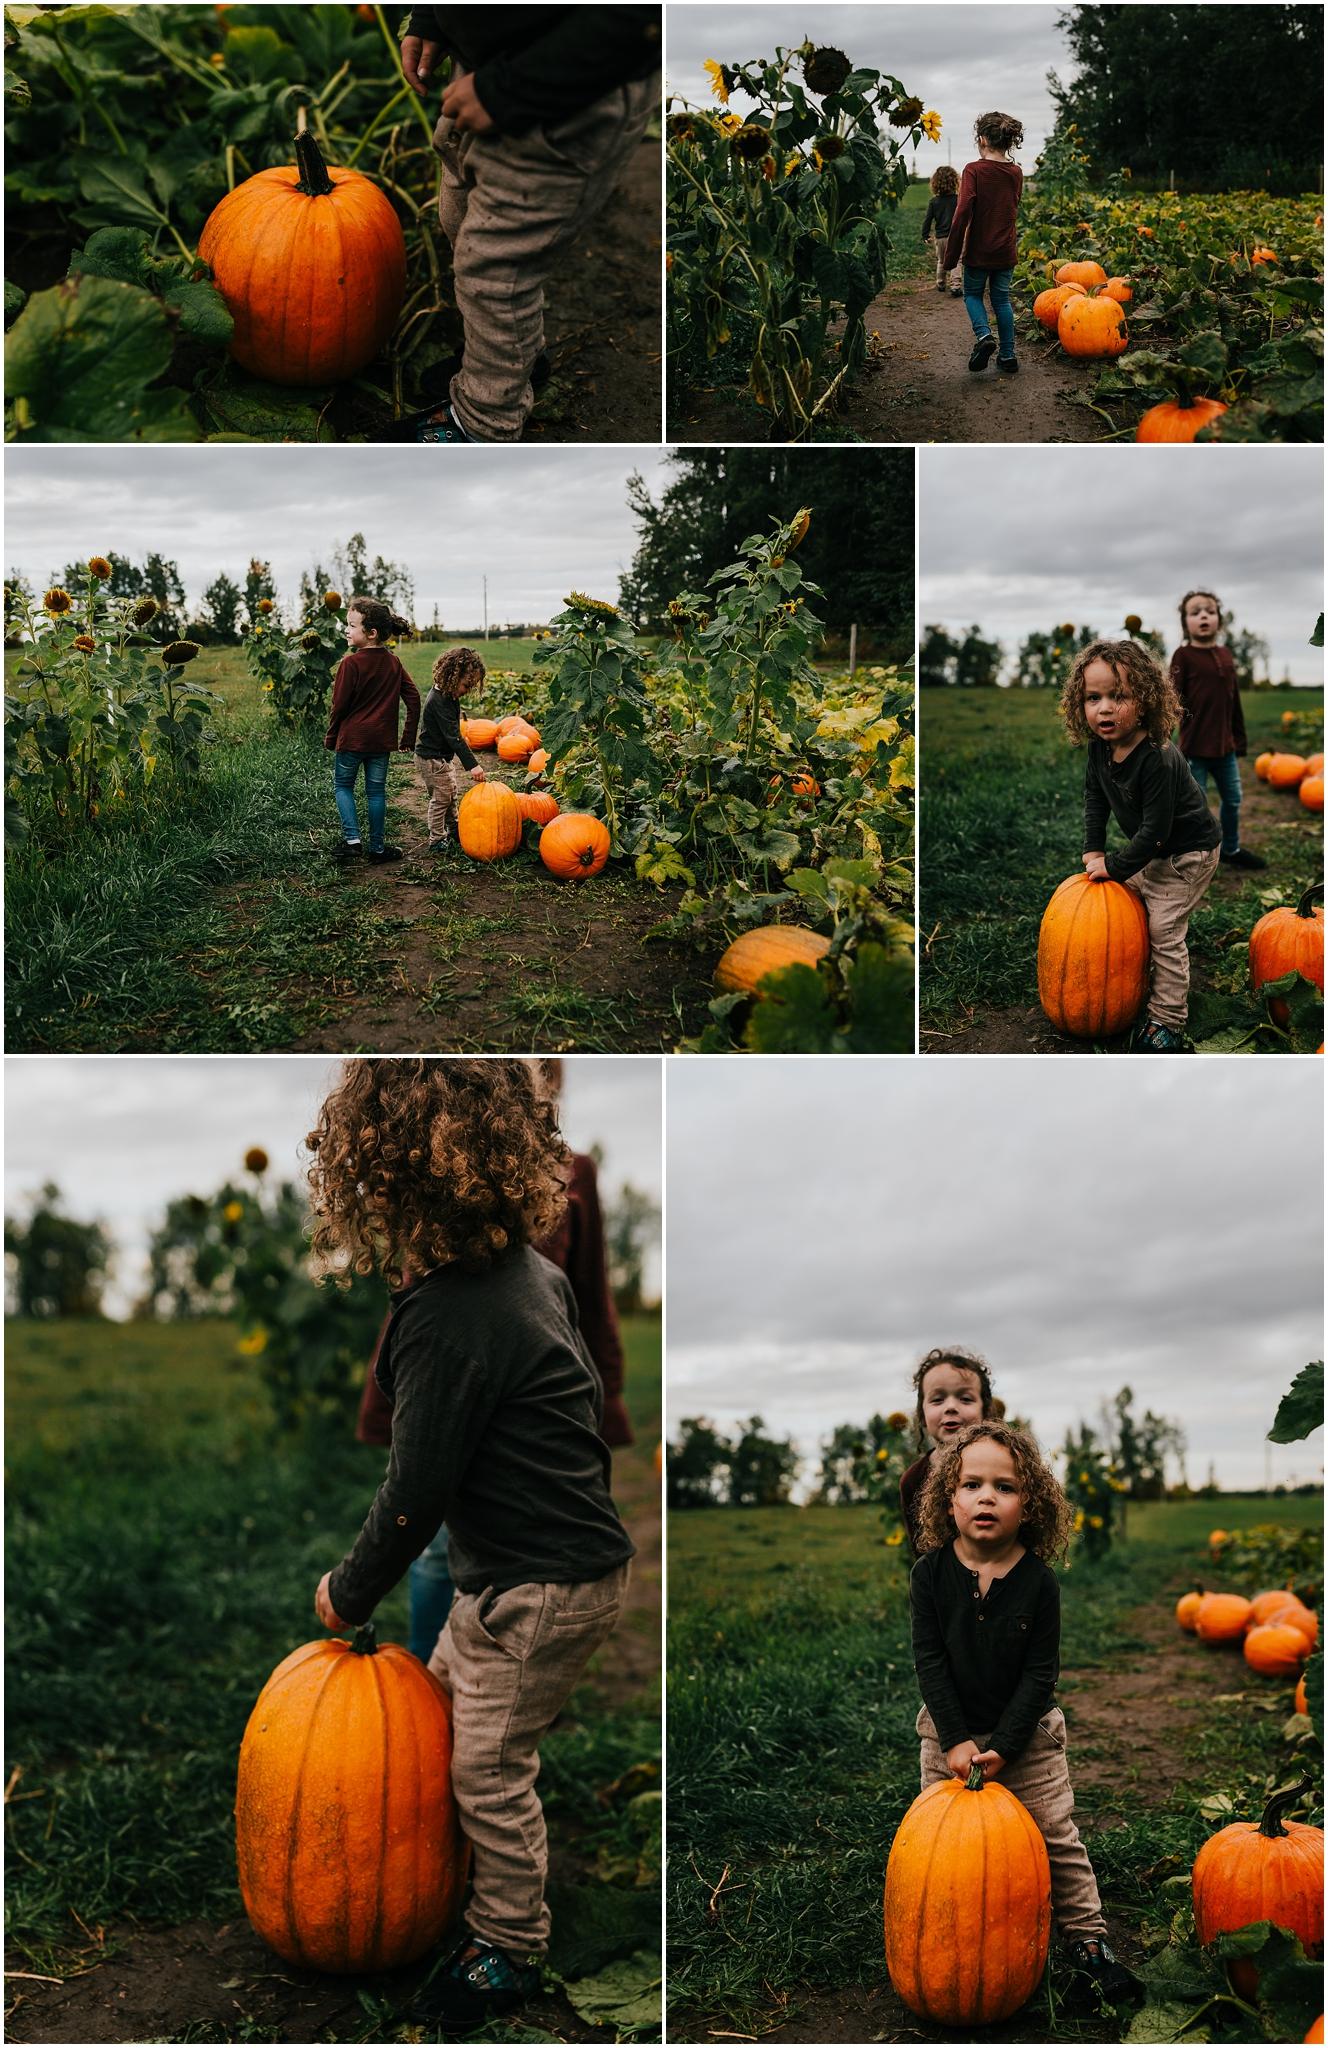 Edmonton Lifestyle Photographer - Treelines Photography - Edmonton Family Photographer - Family Photography - Somerset Farms